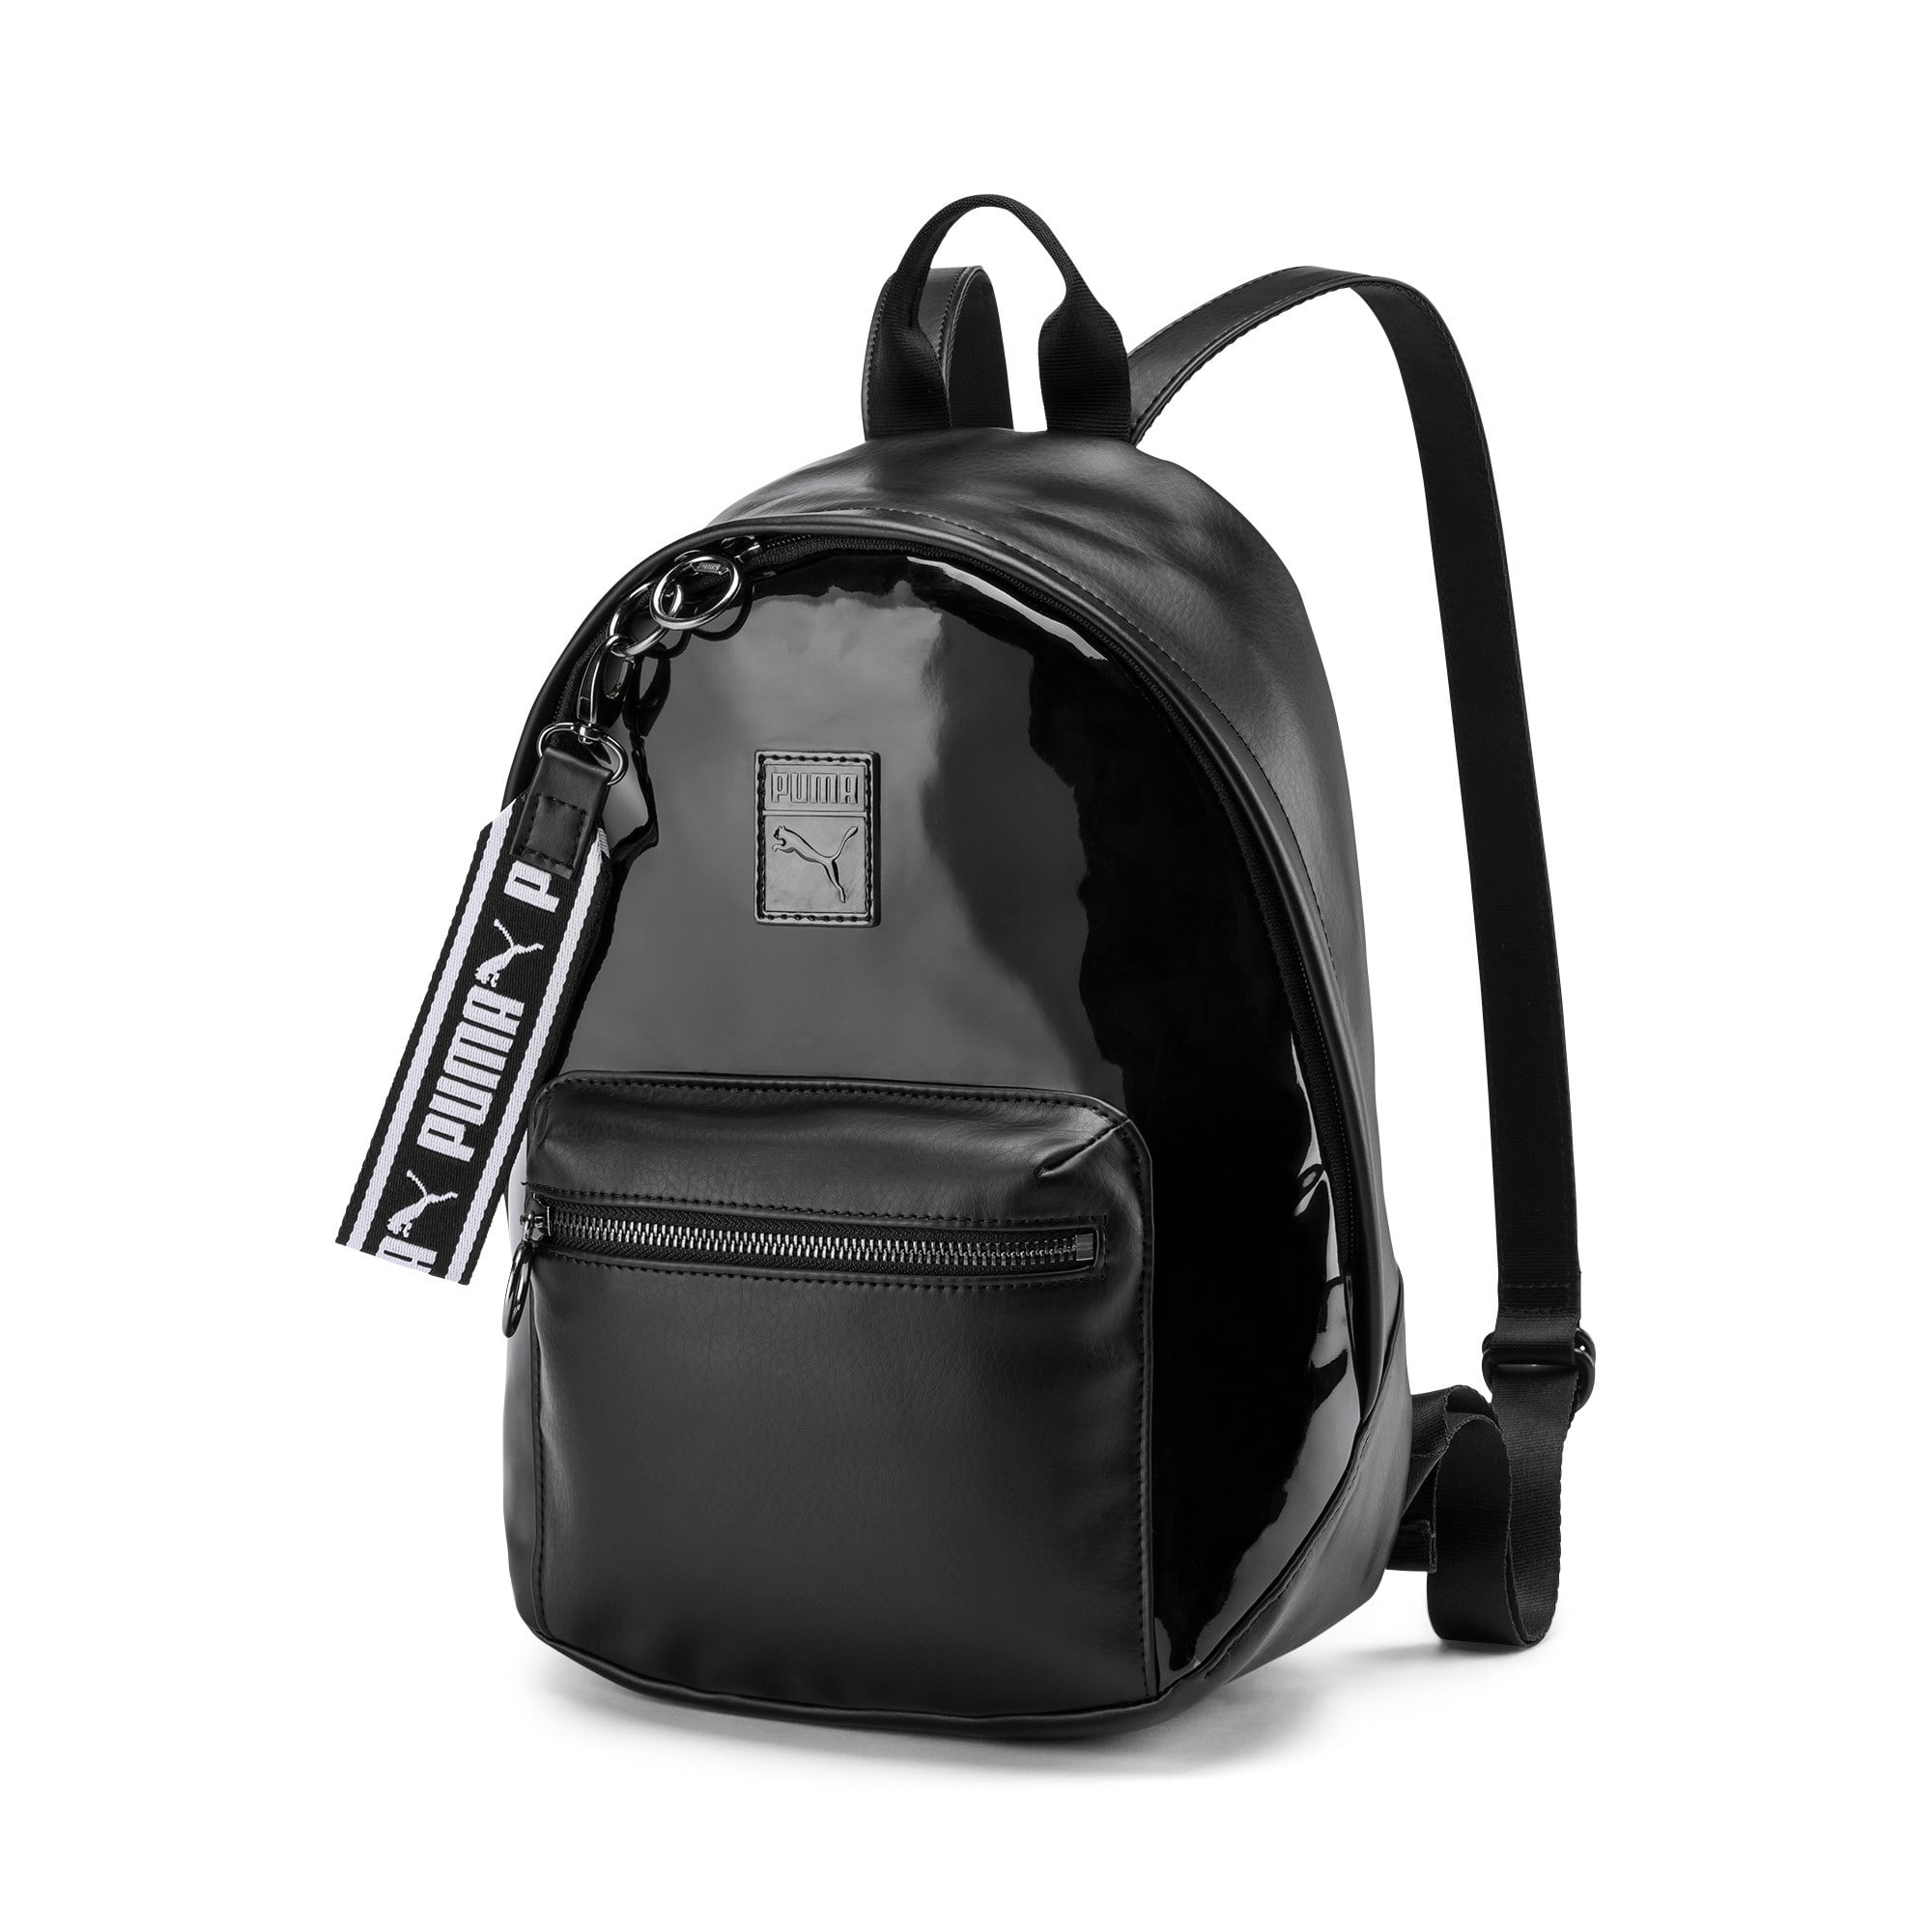 Thumbnail 1 of Prime Premium Archive Backpack, Puma Black, medium